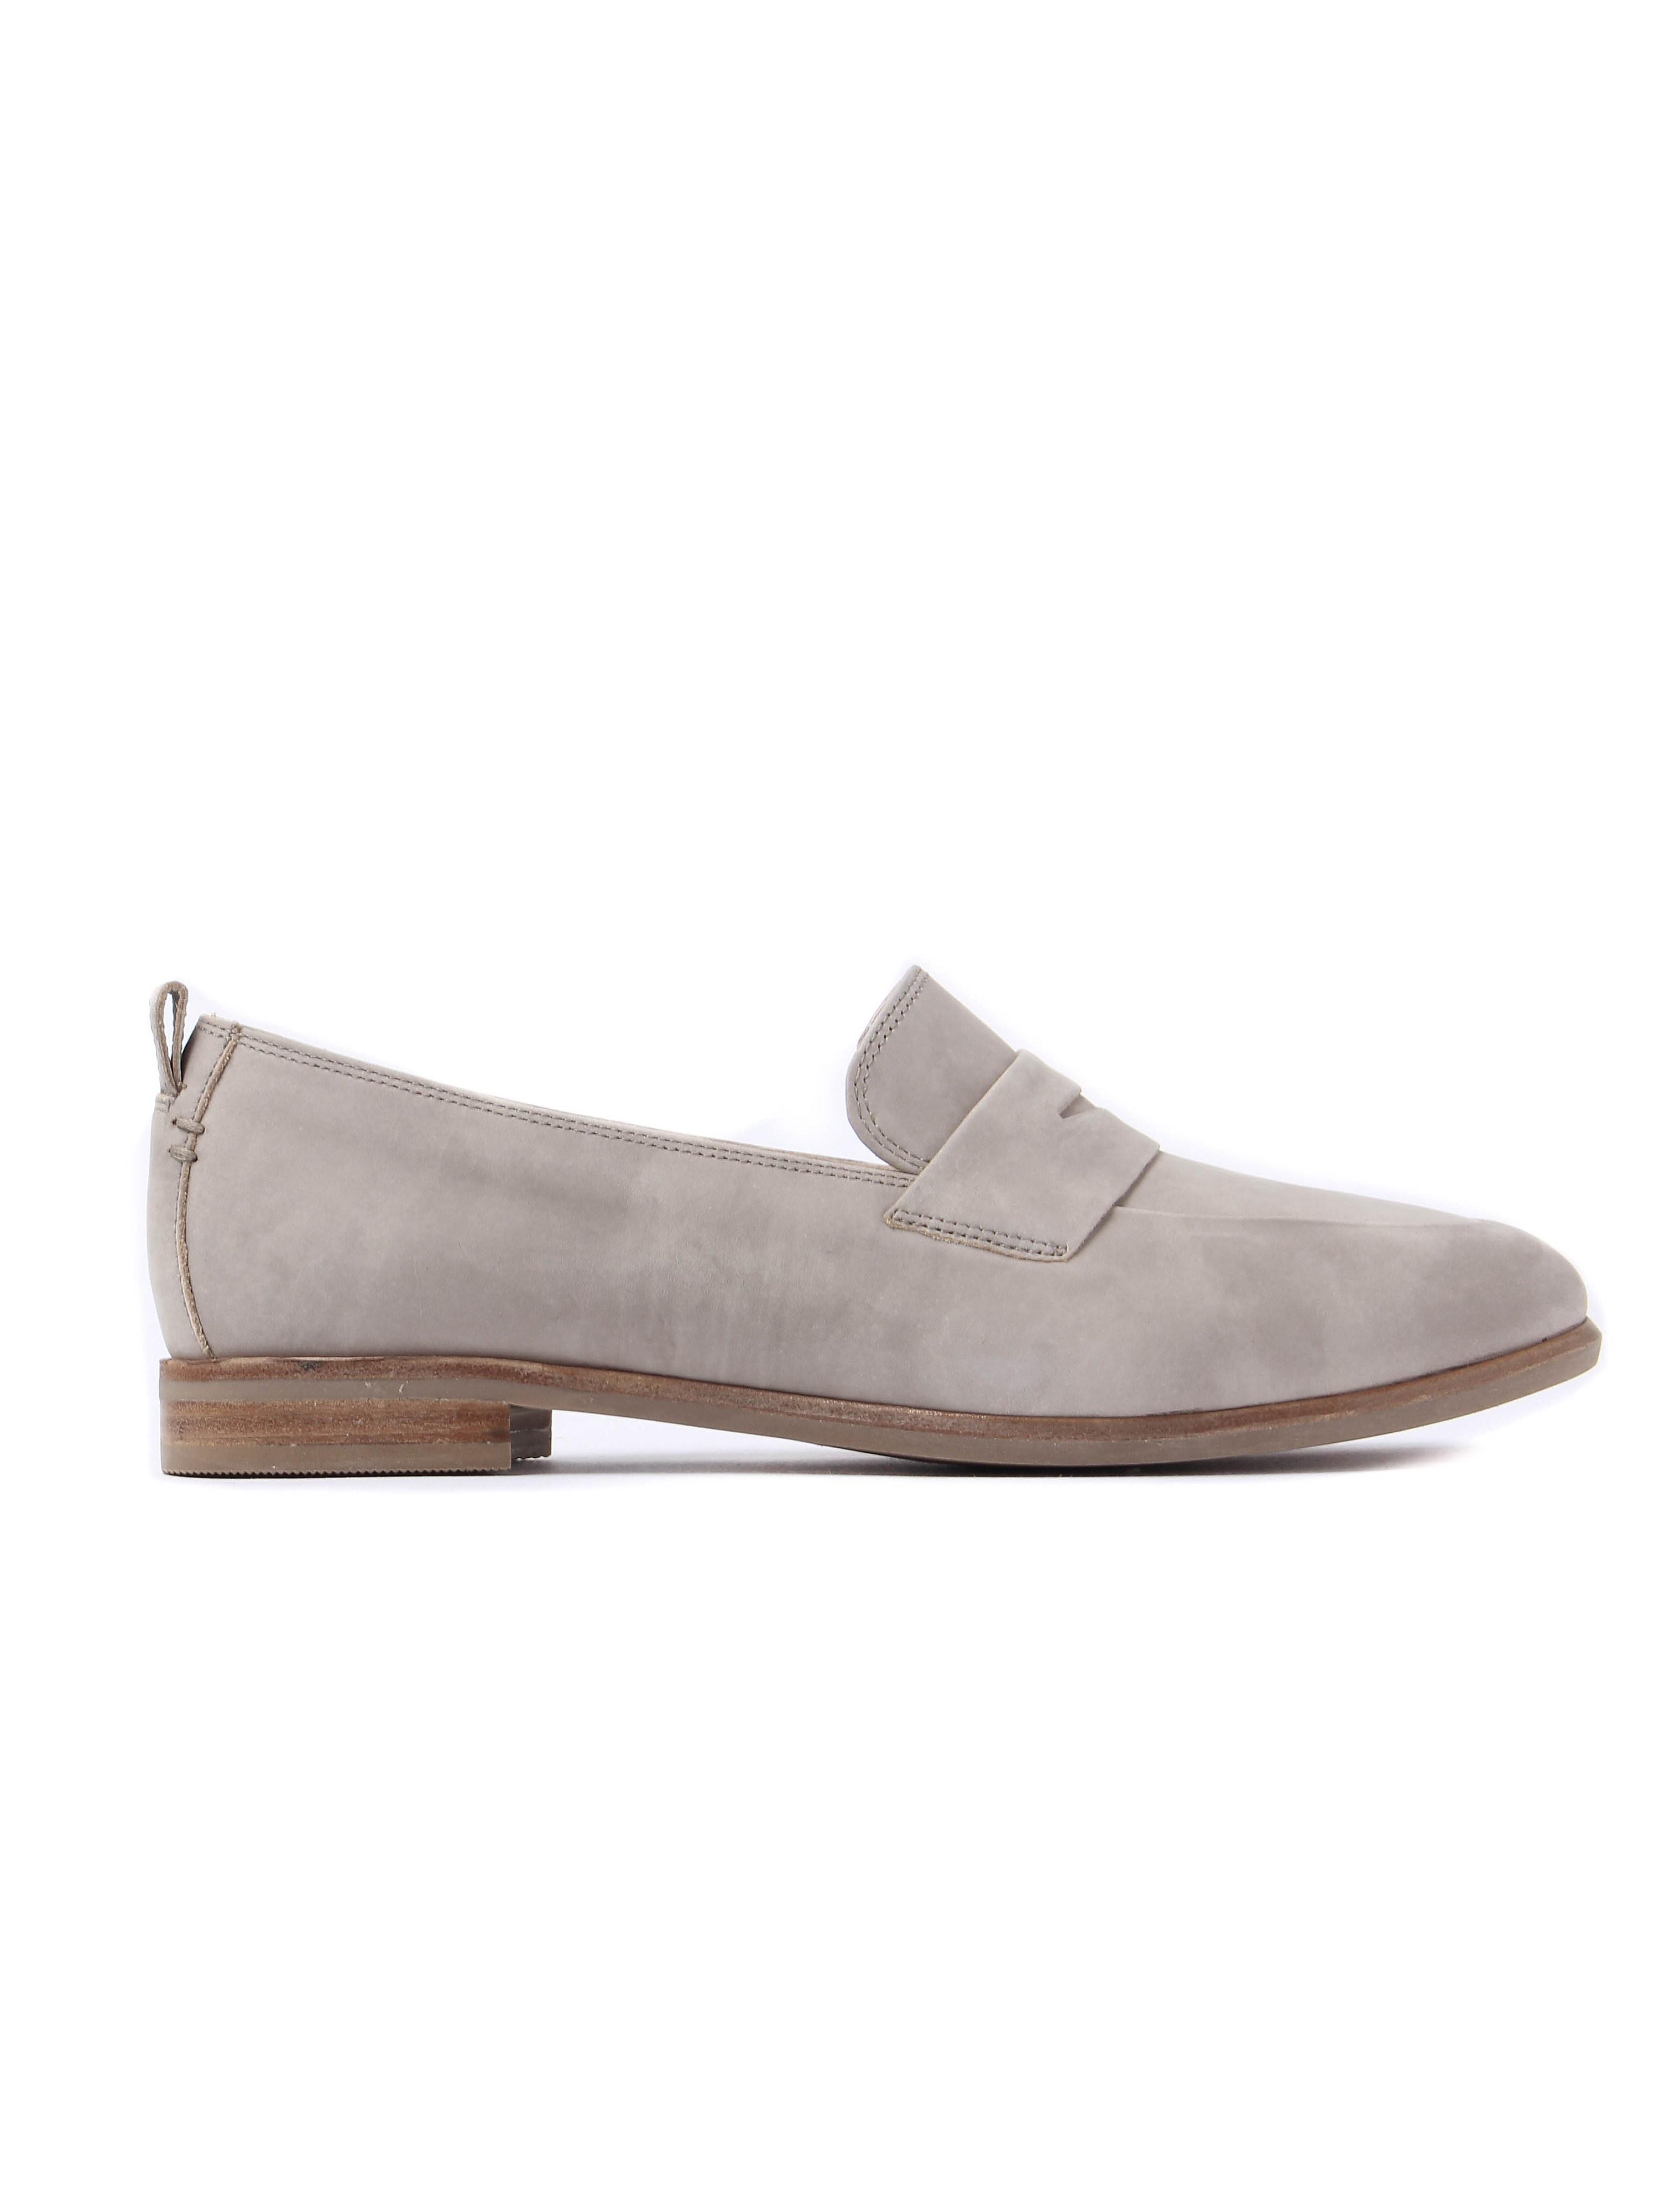 Clarks Women's Alania Belle Nubuck Loafers - Sand